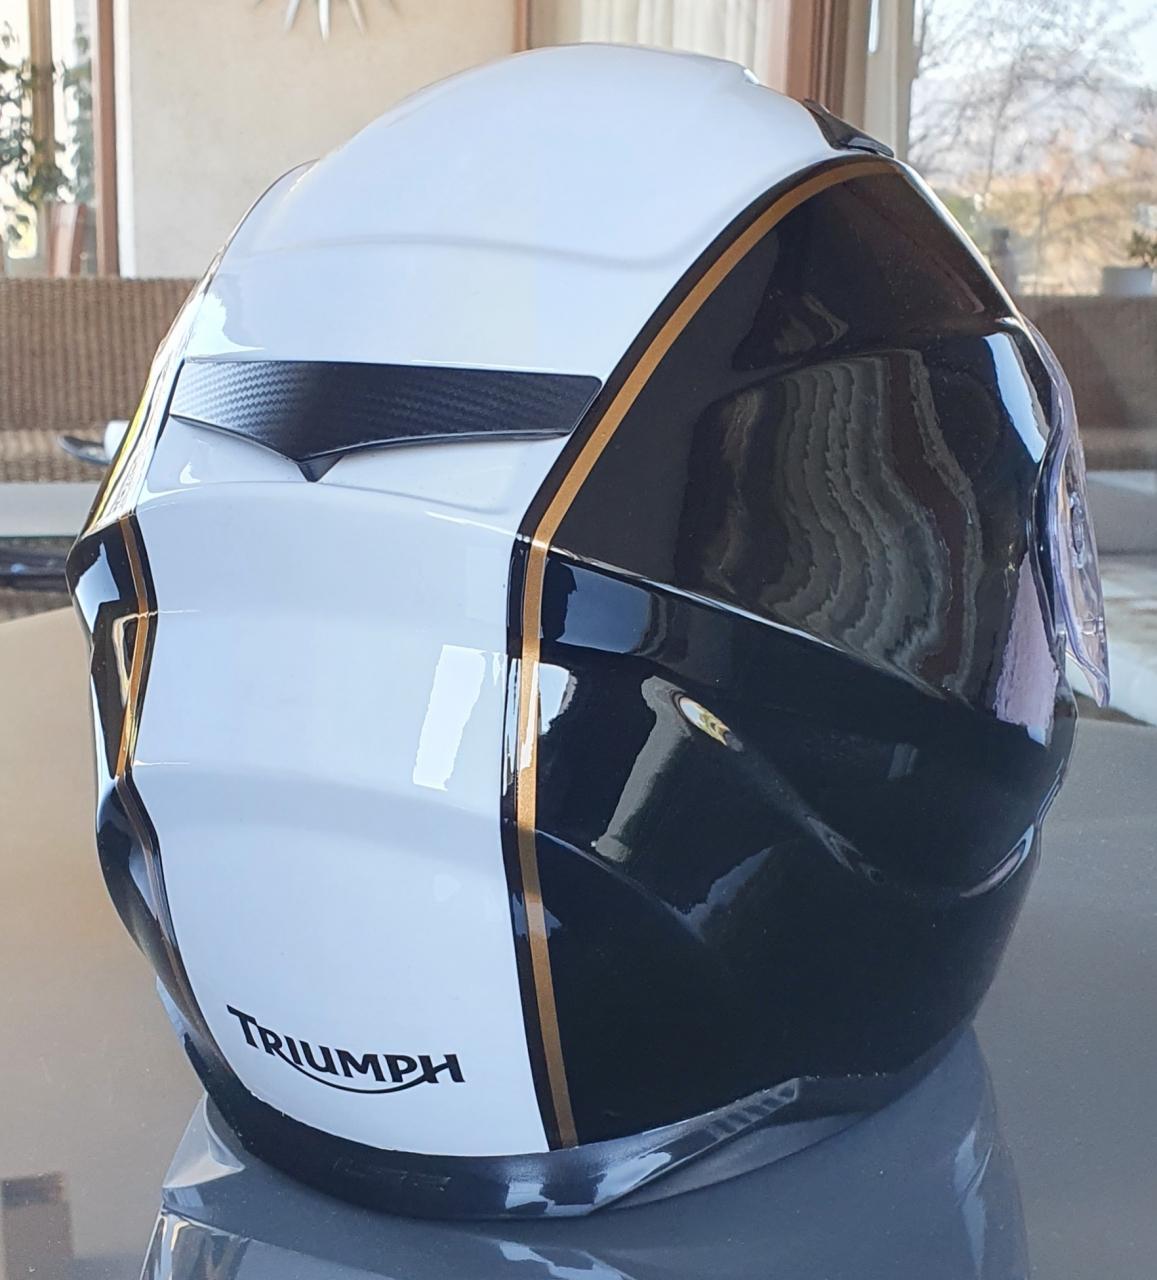 Helmet restailing